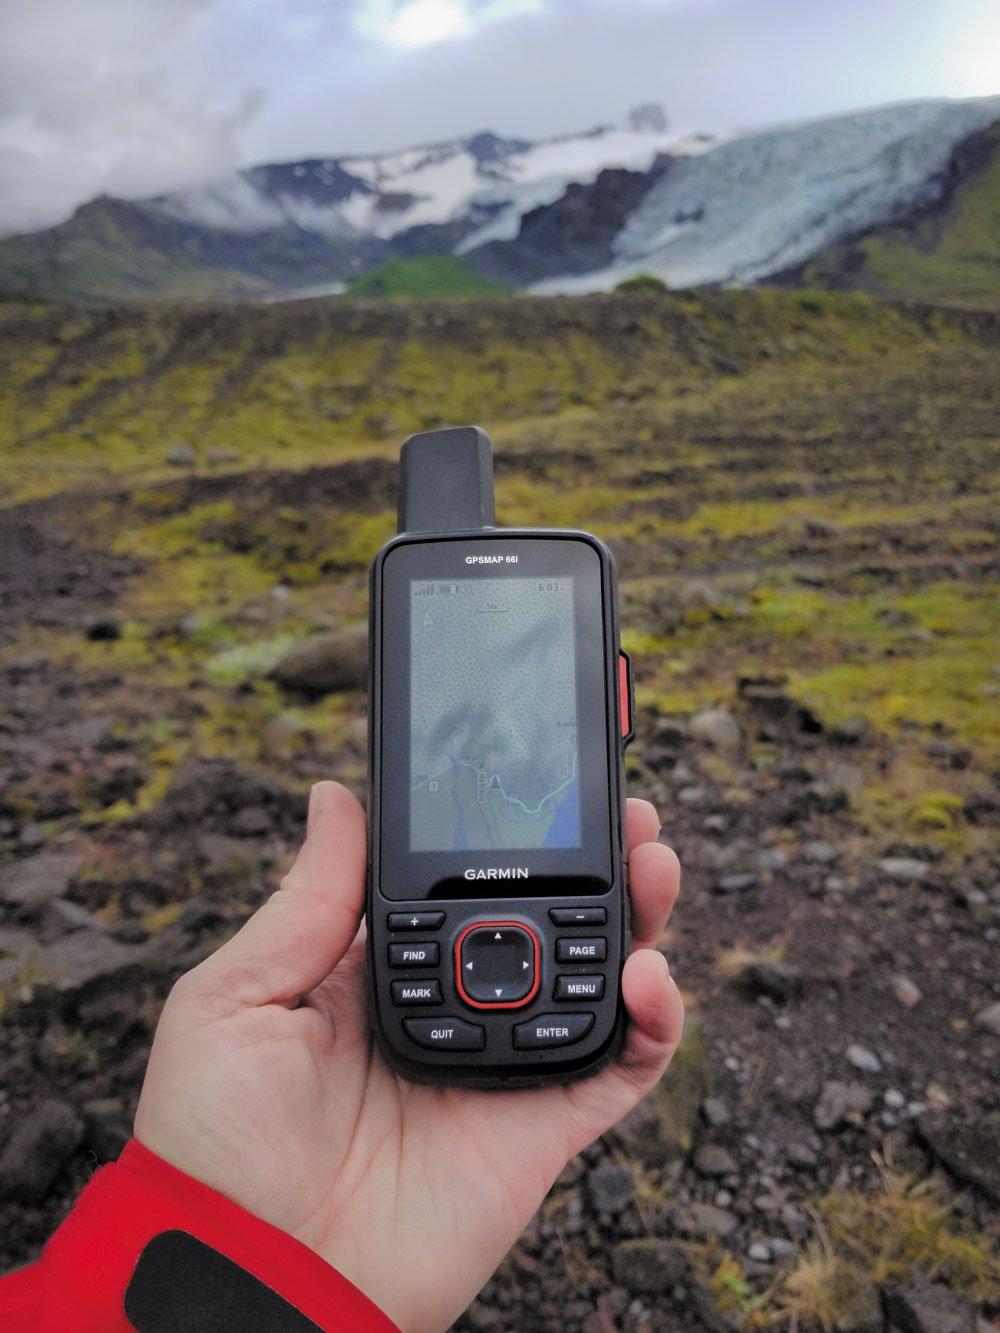 Garmin's GPSMAP 66i Handheld GPS